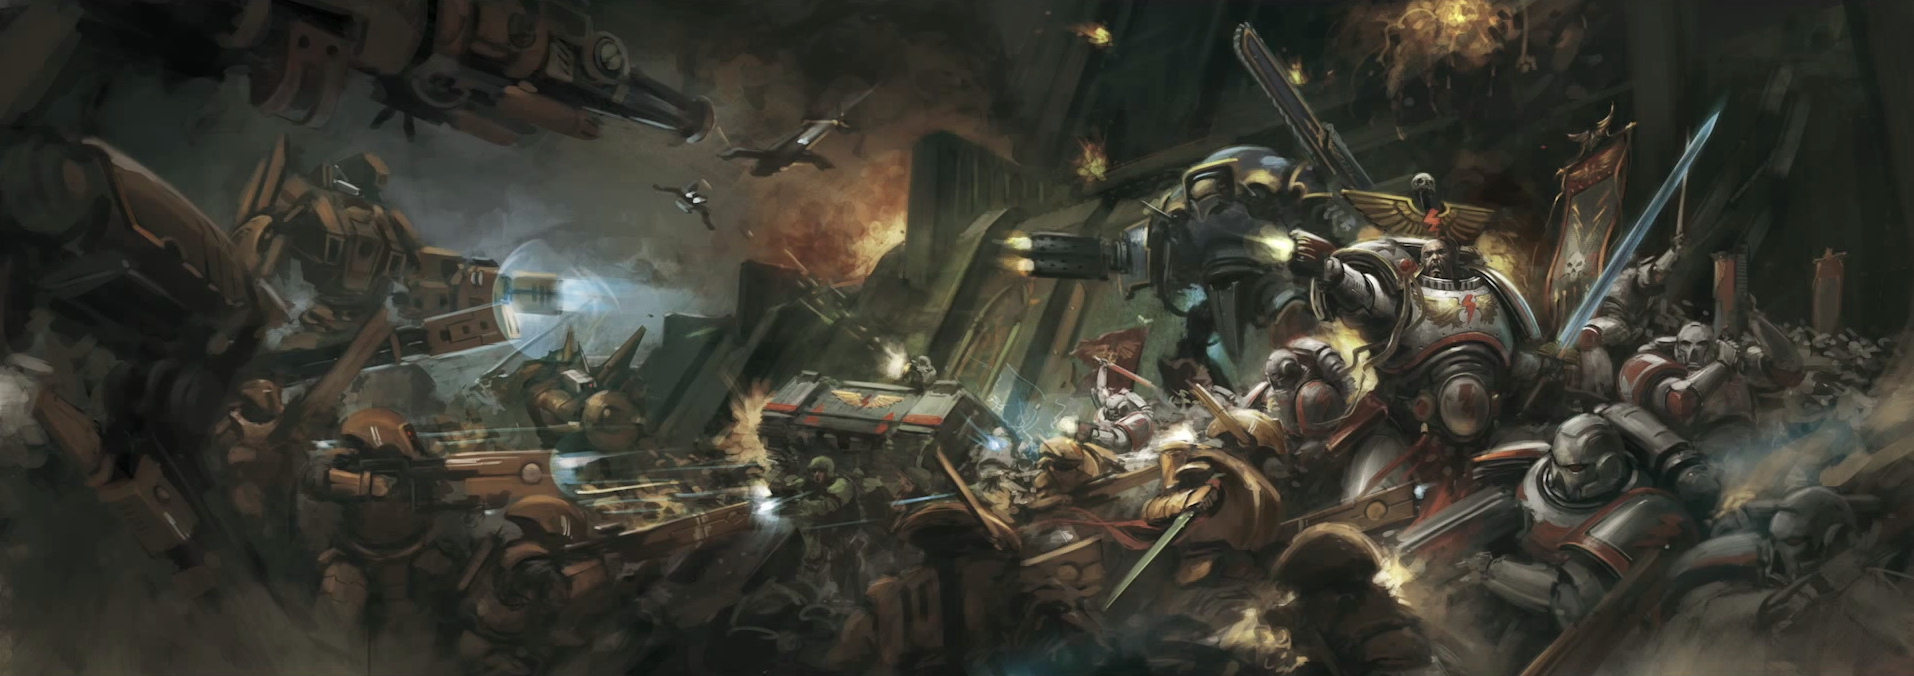 Warhammer 40k Tau Vs Imperium 1167930 Hd Wallpaper